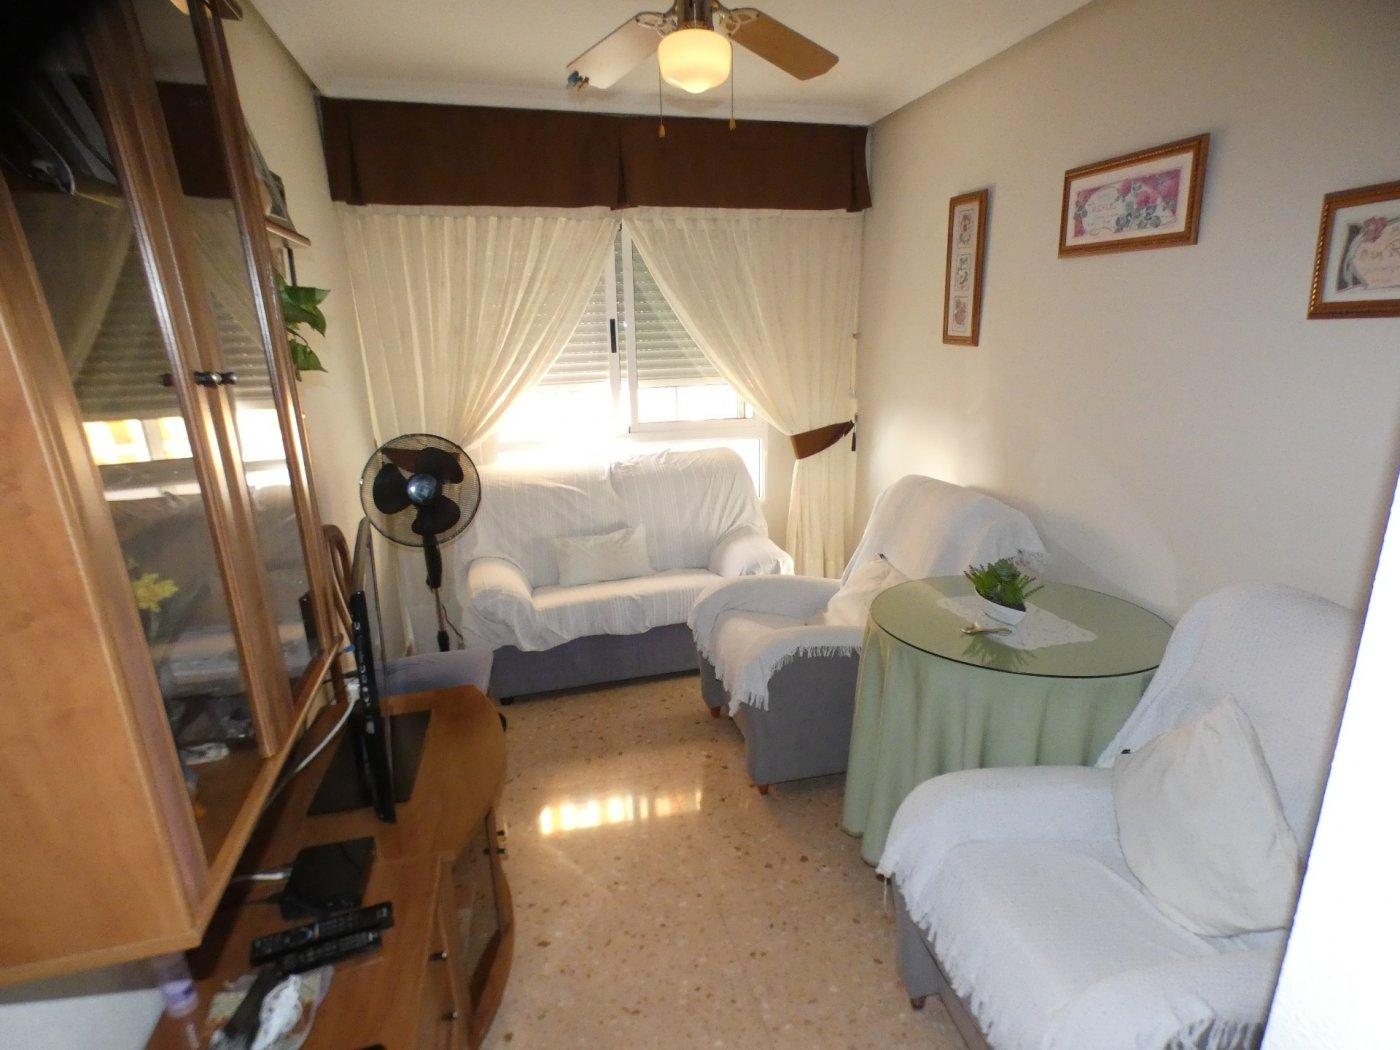 Piso 4 dormitorios tombola - imagenInmueble10